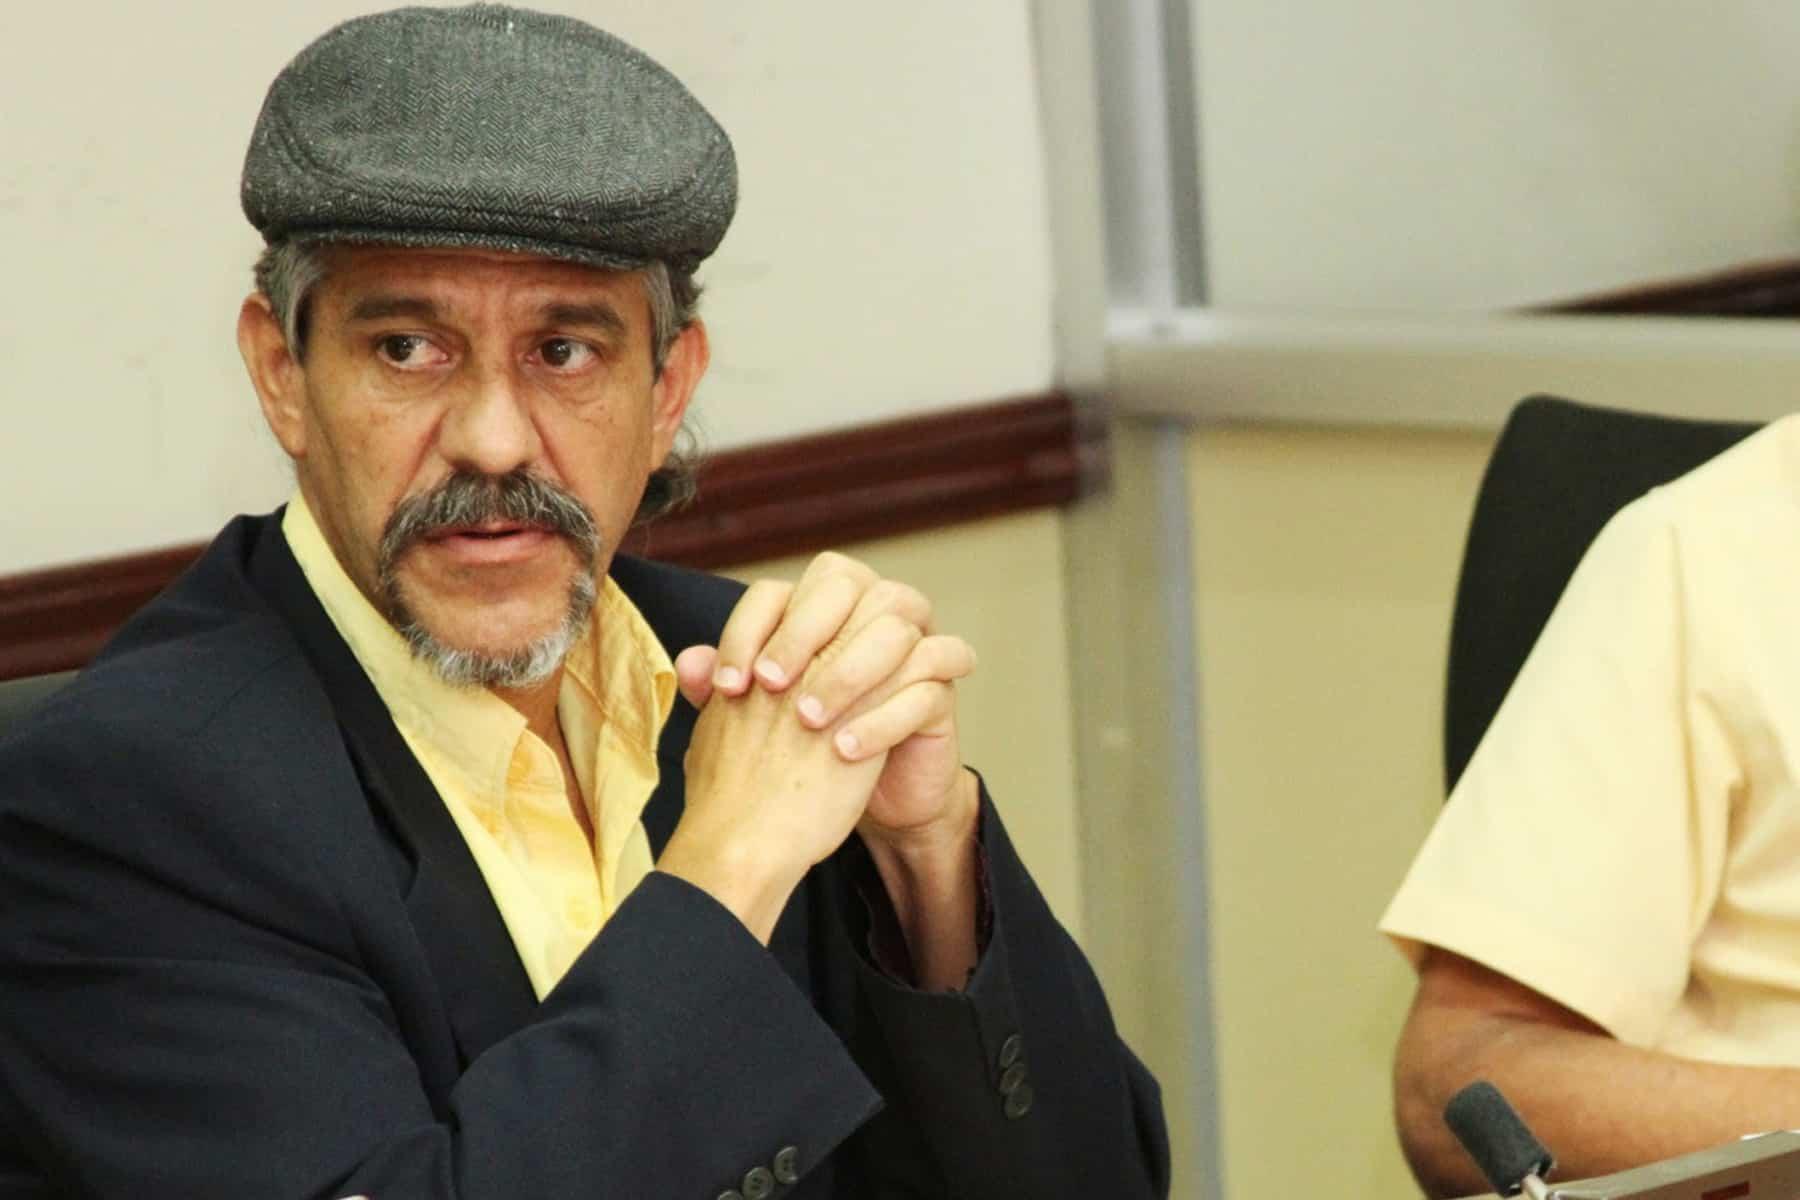 Broad Front legislator Ronal Vargas Araya